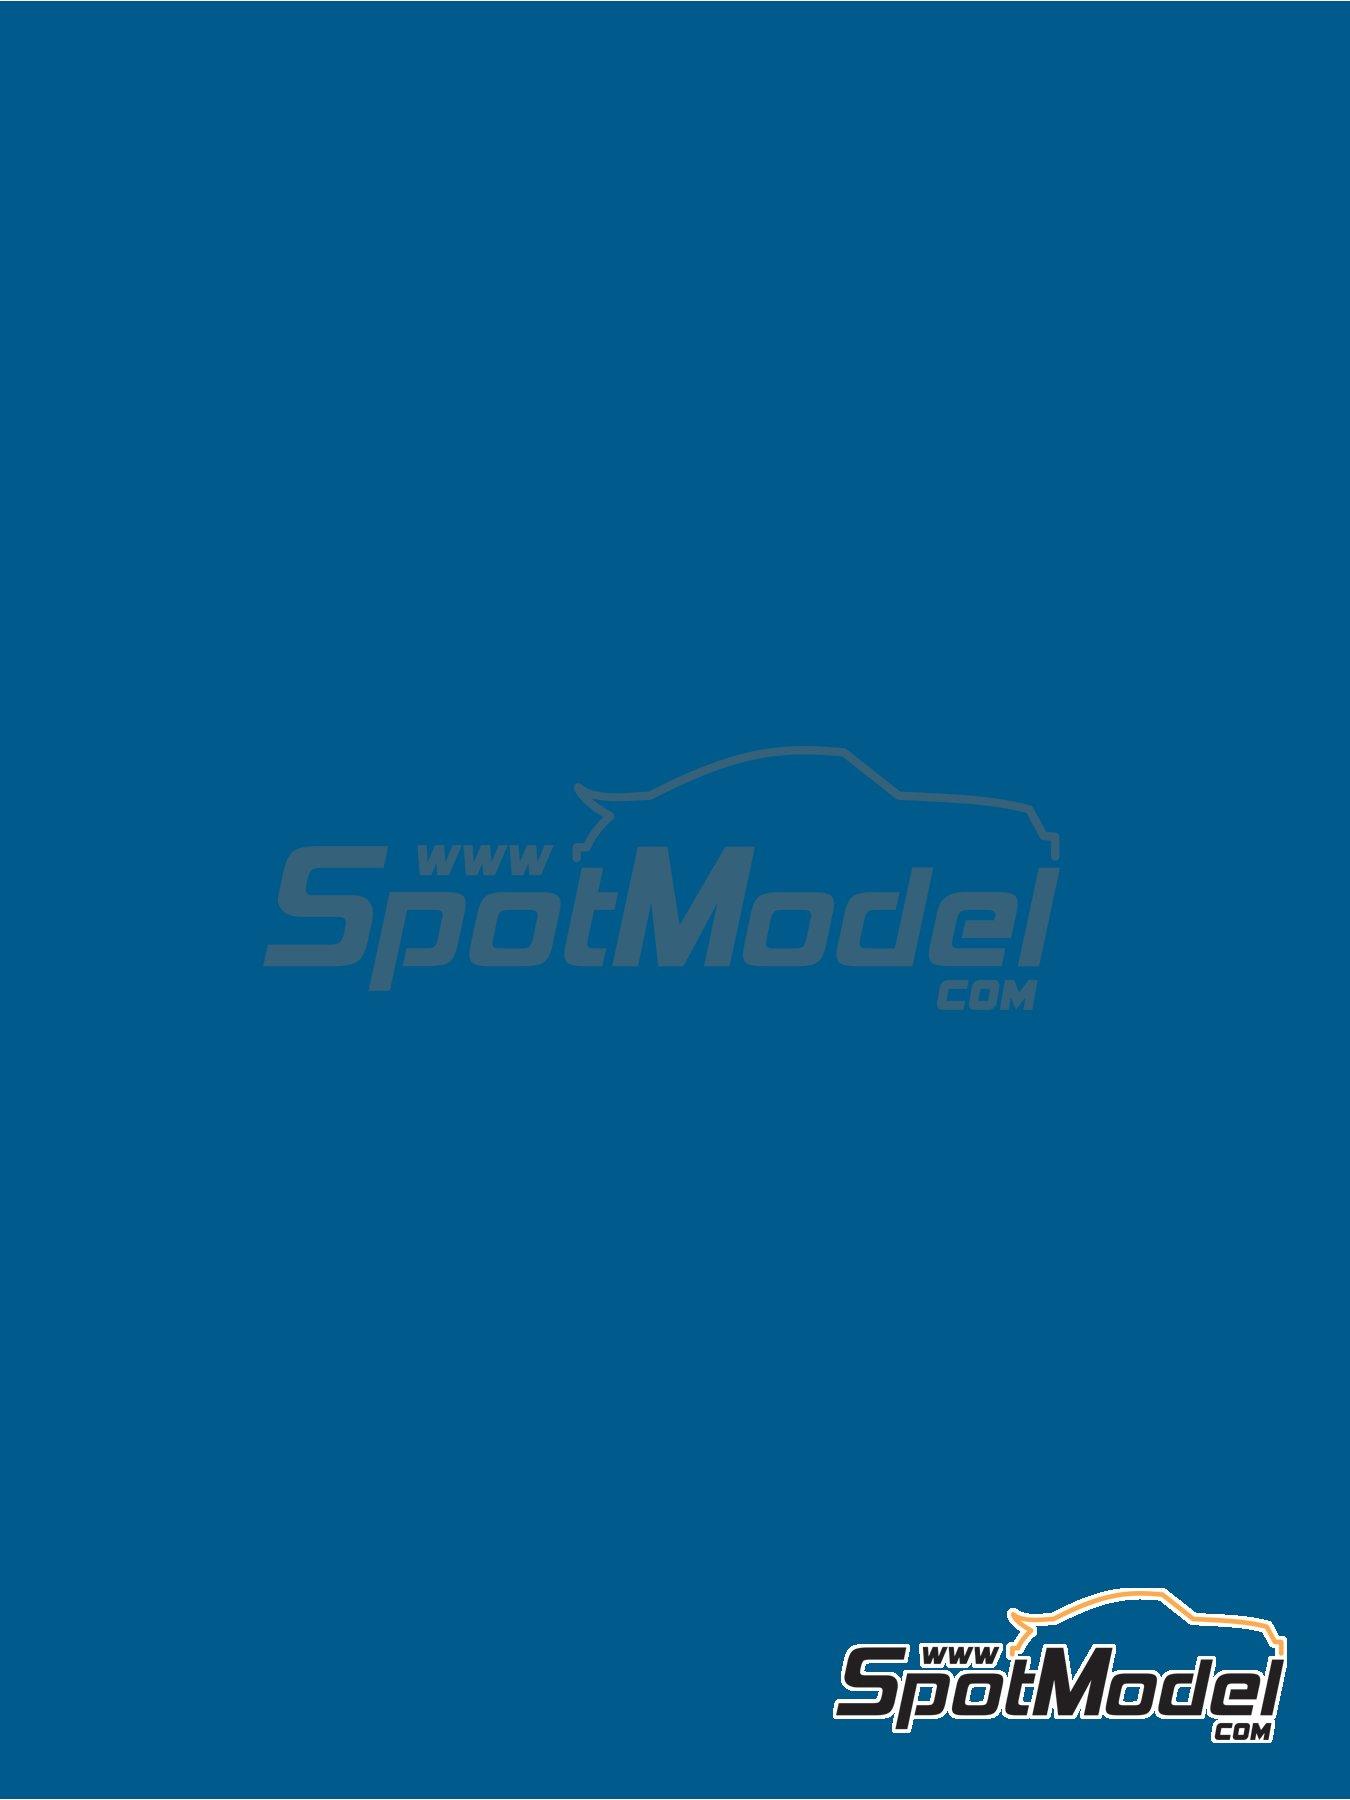 Azul tráfico - RAL5017 - Traffic blue - 1 x 60ml | Pintura fabricado por Zero Paints (ref.ZP-1033-RAL5017) image